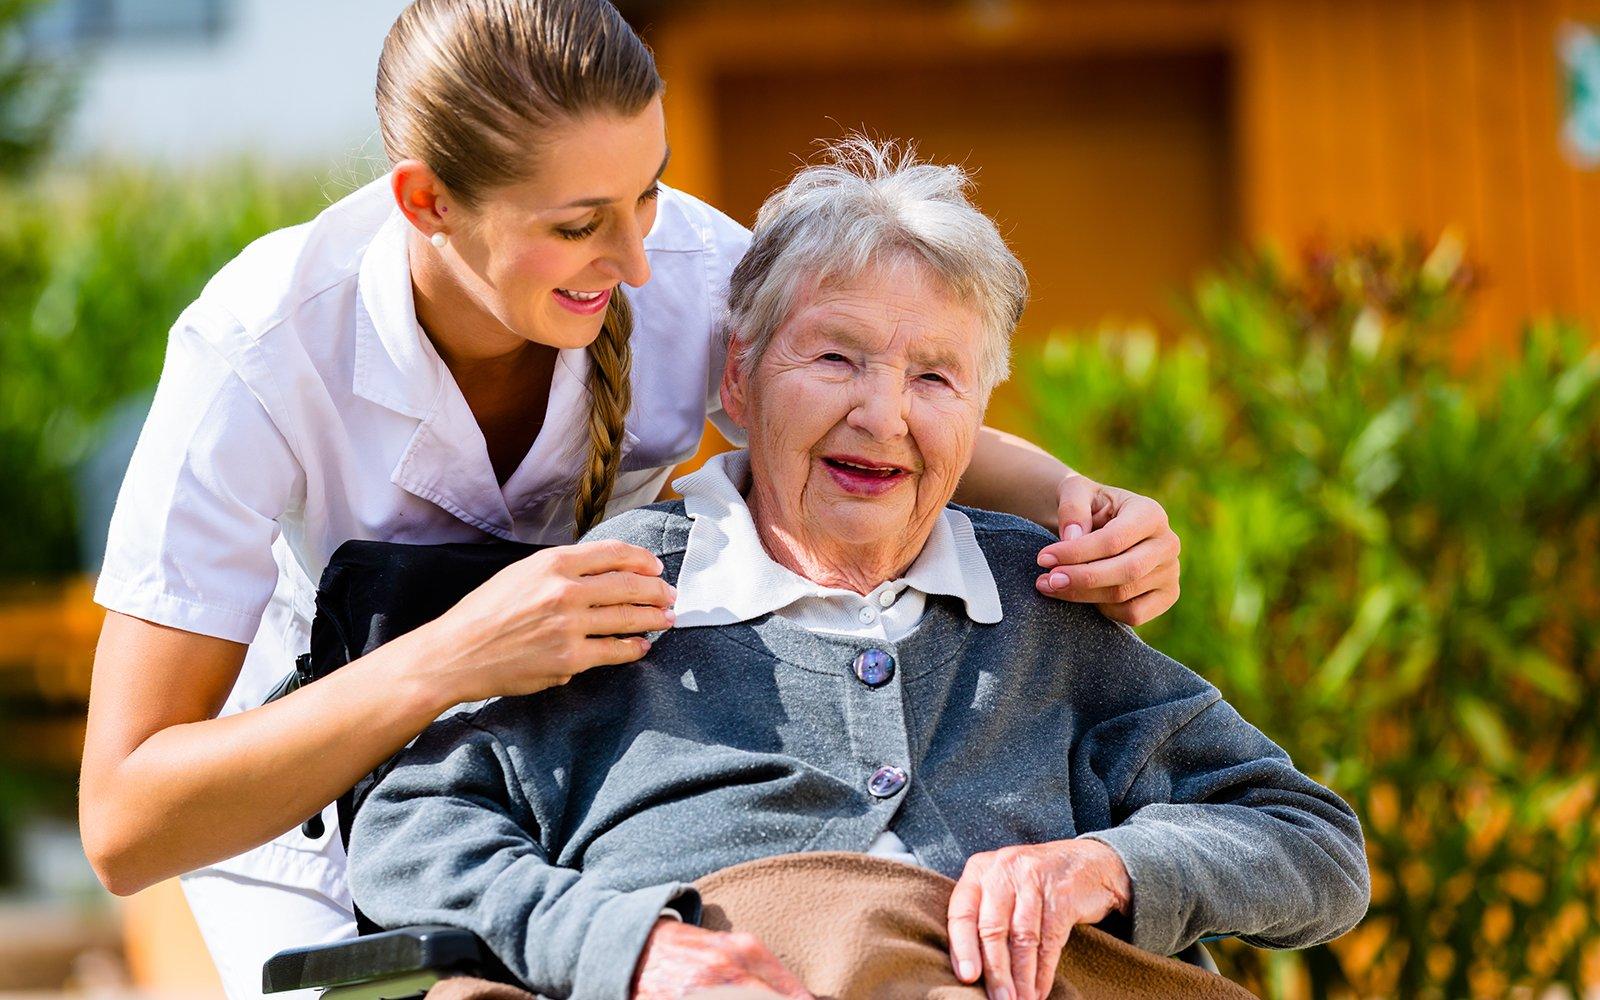 Anziana seduta sorridente con infermiera